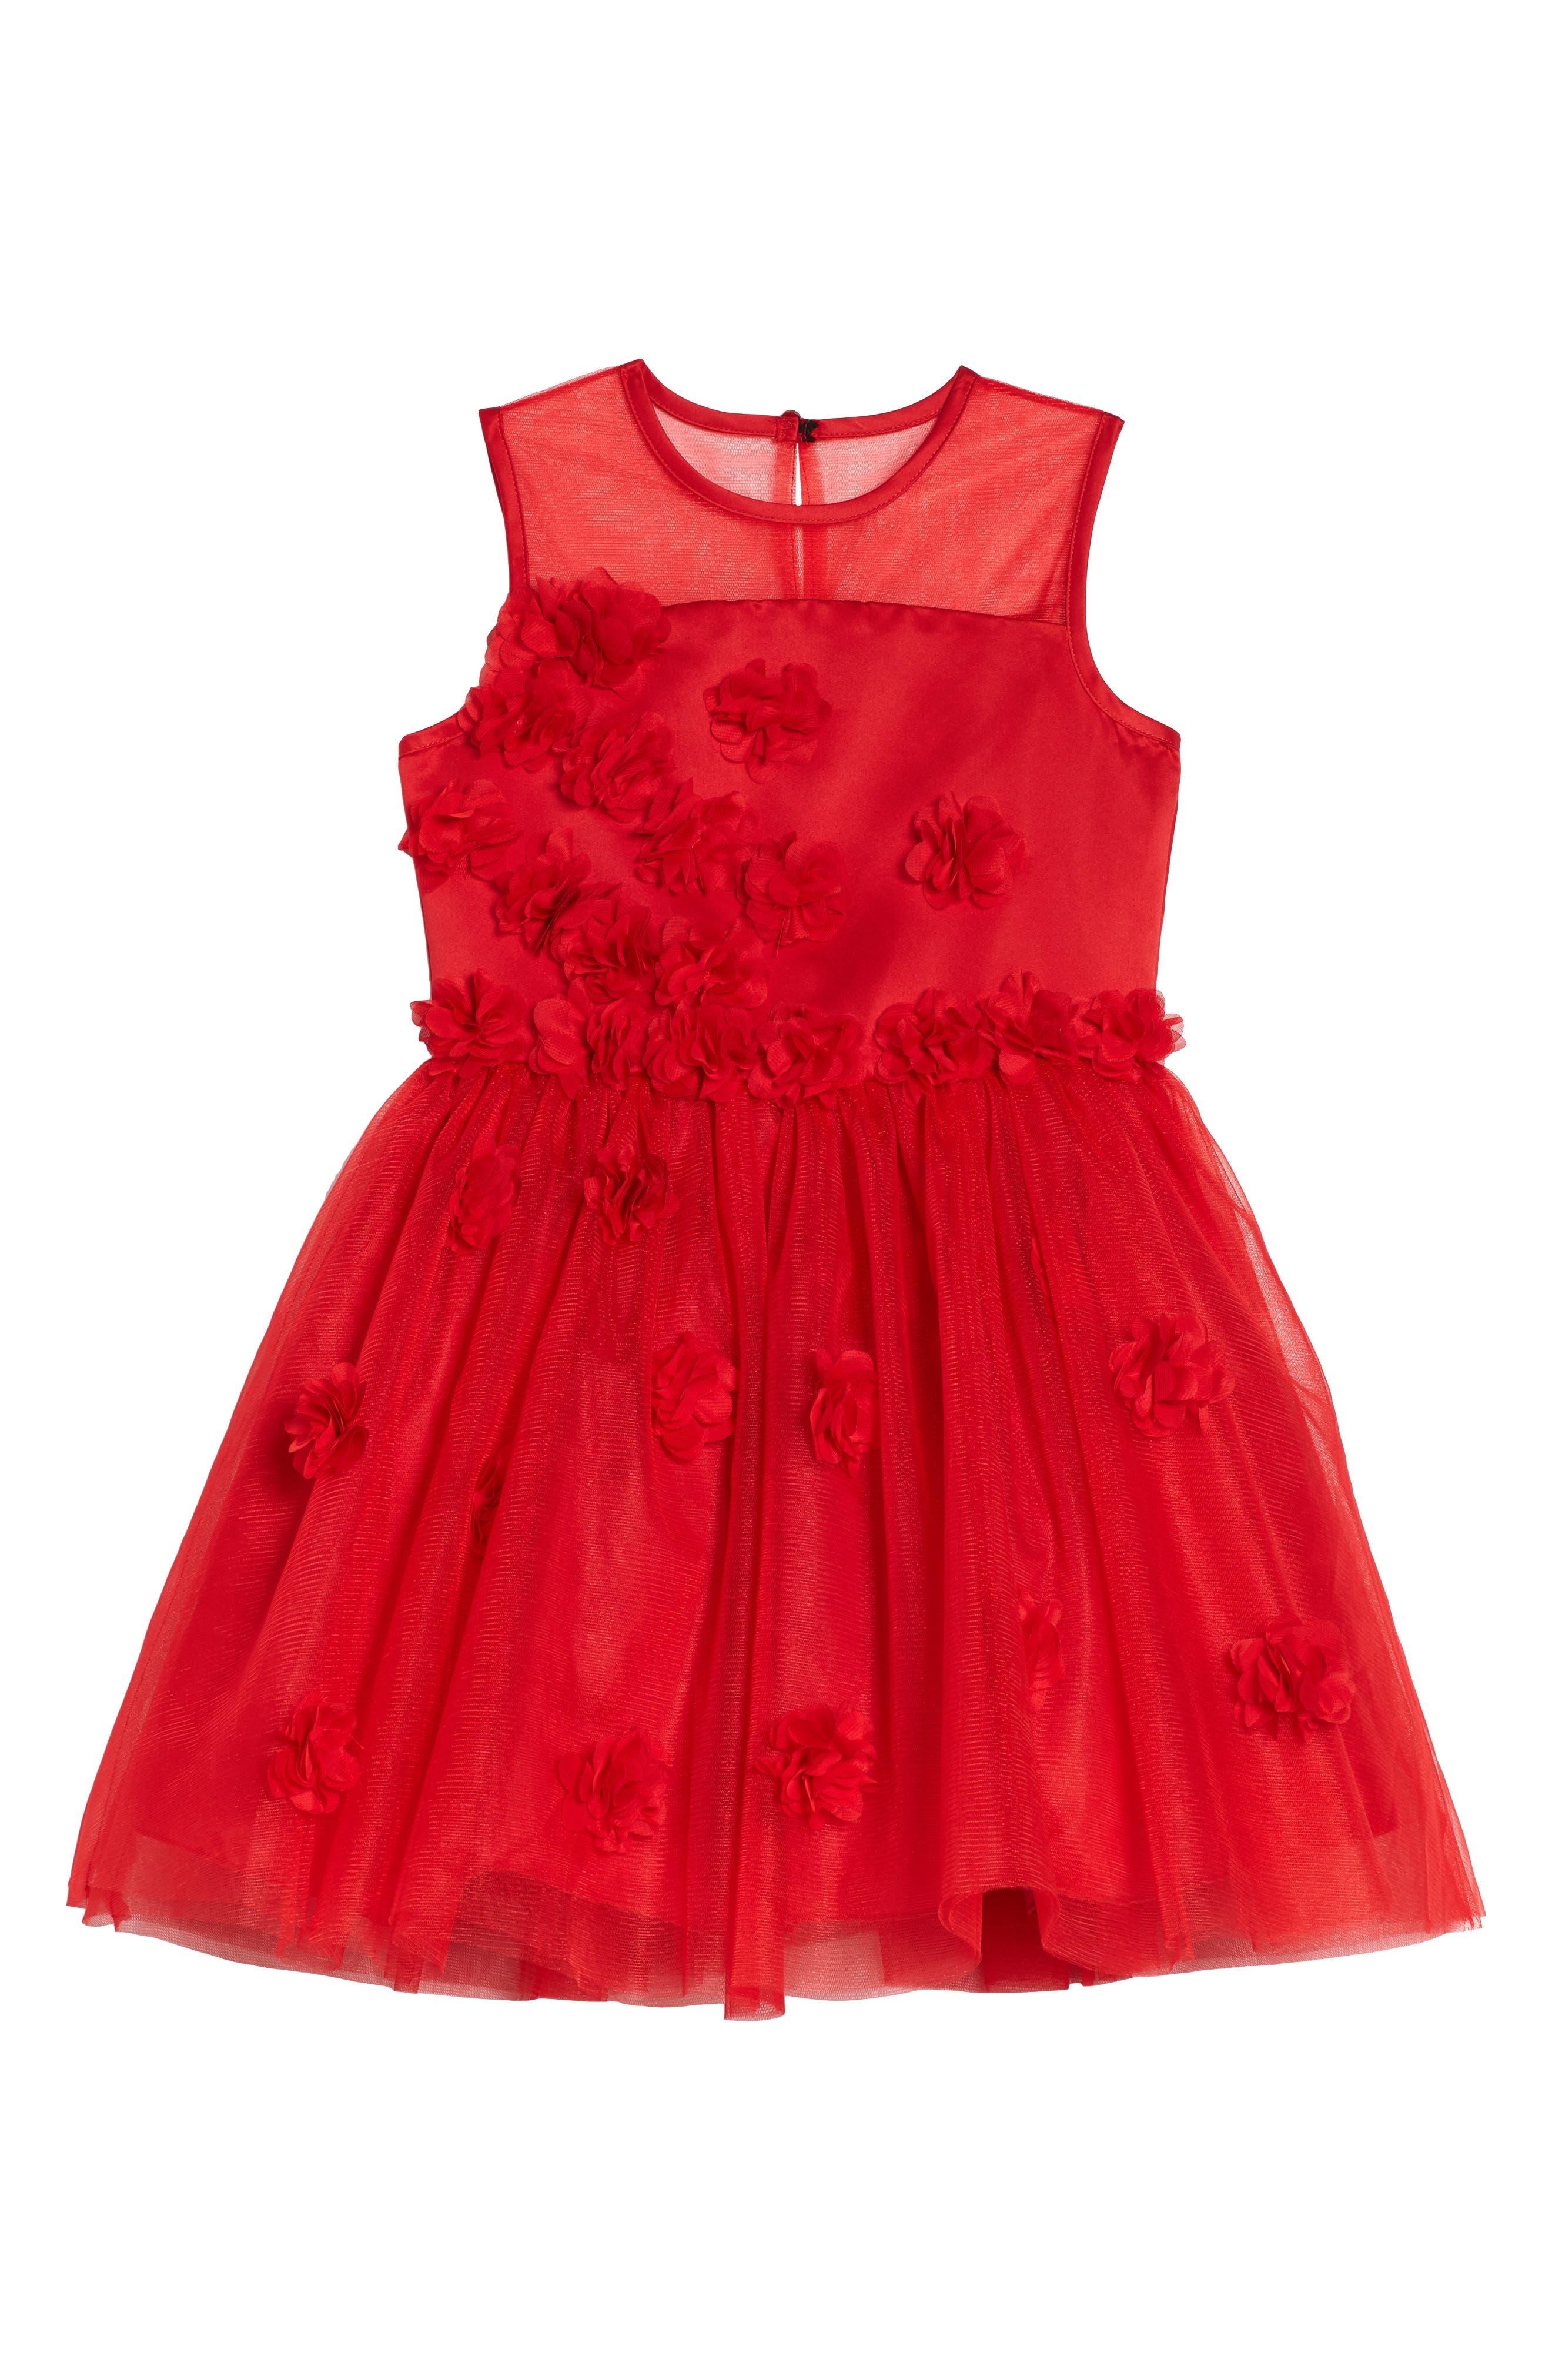 Floral Embellished Sleeveless Dress,                             Main thumbnail 1, color,                             610